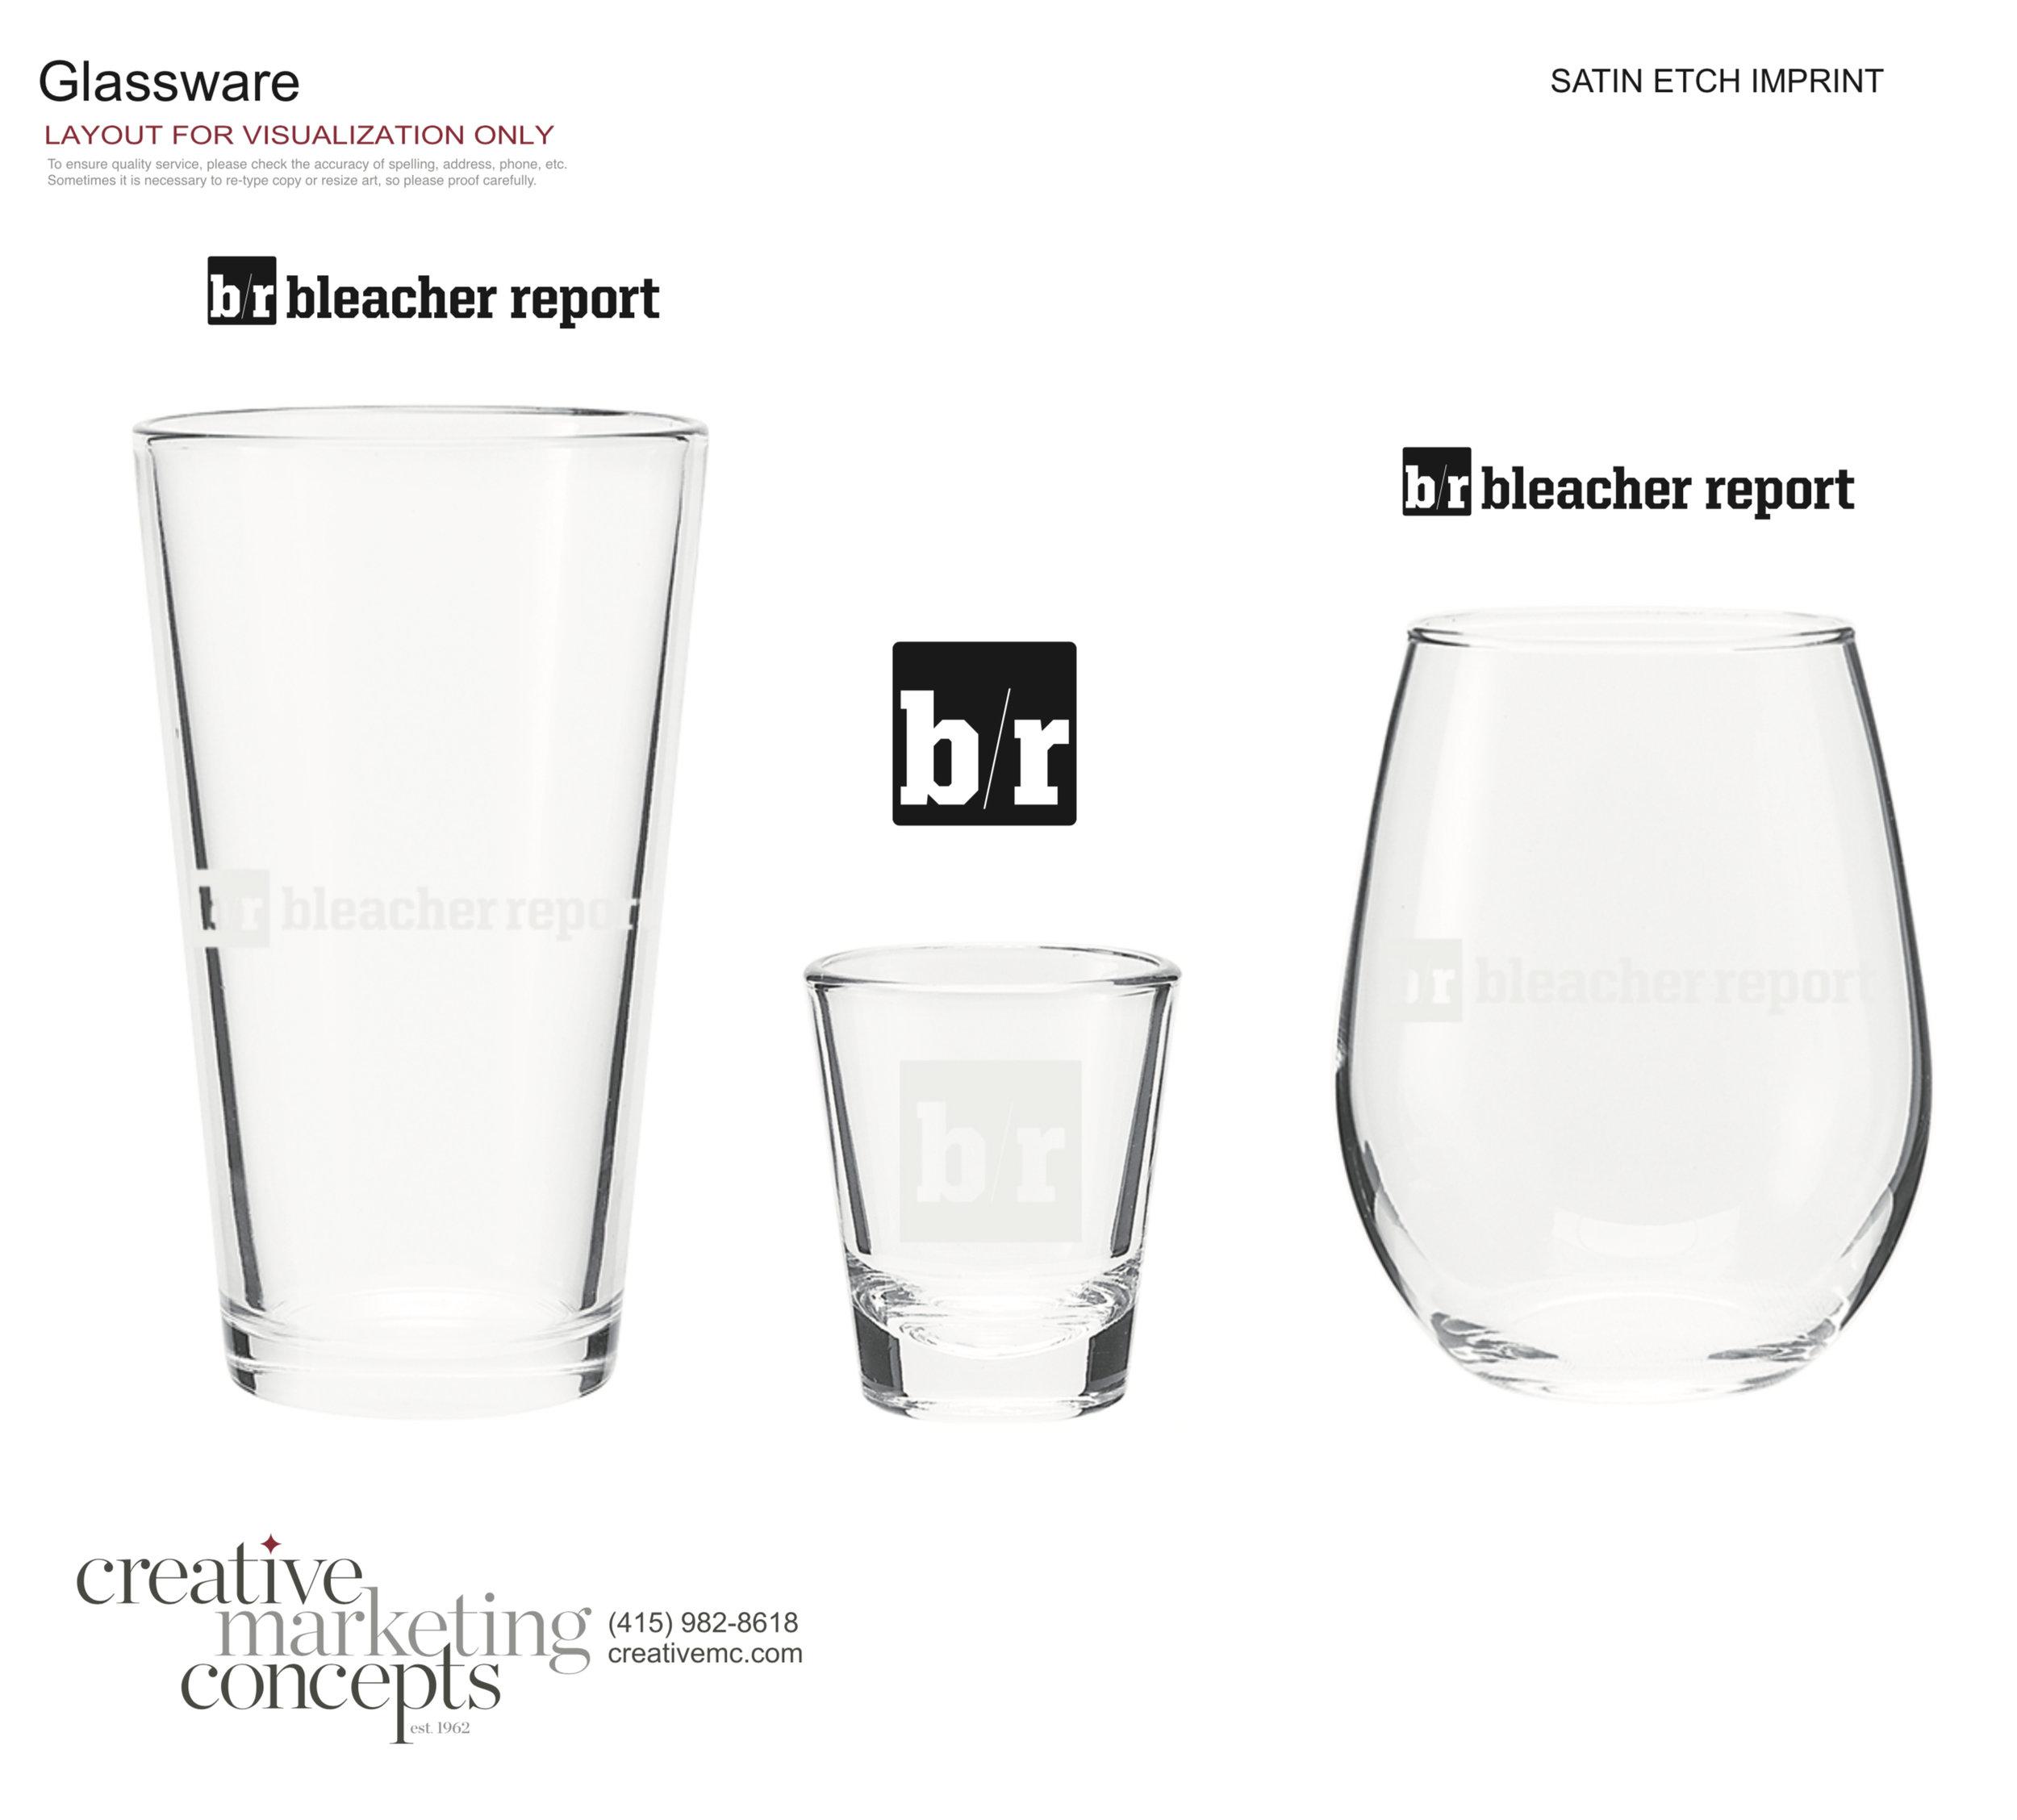 glassware_cmc_layout.jpg